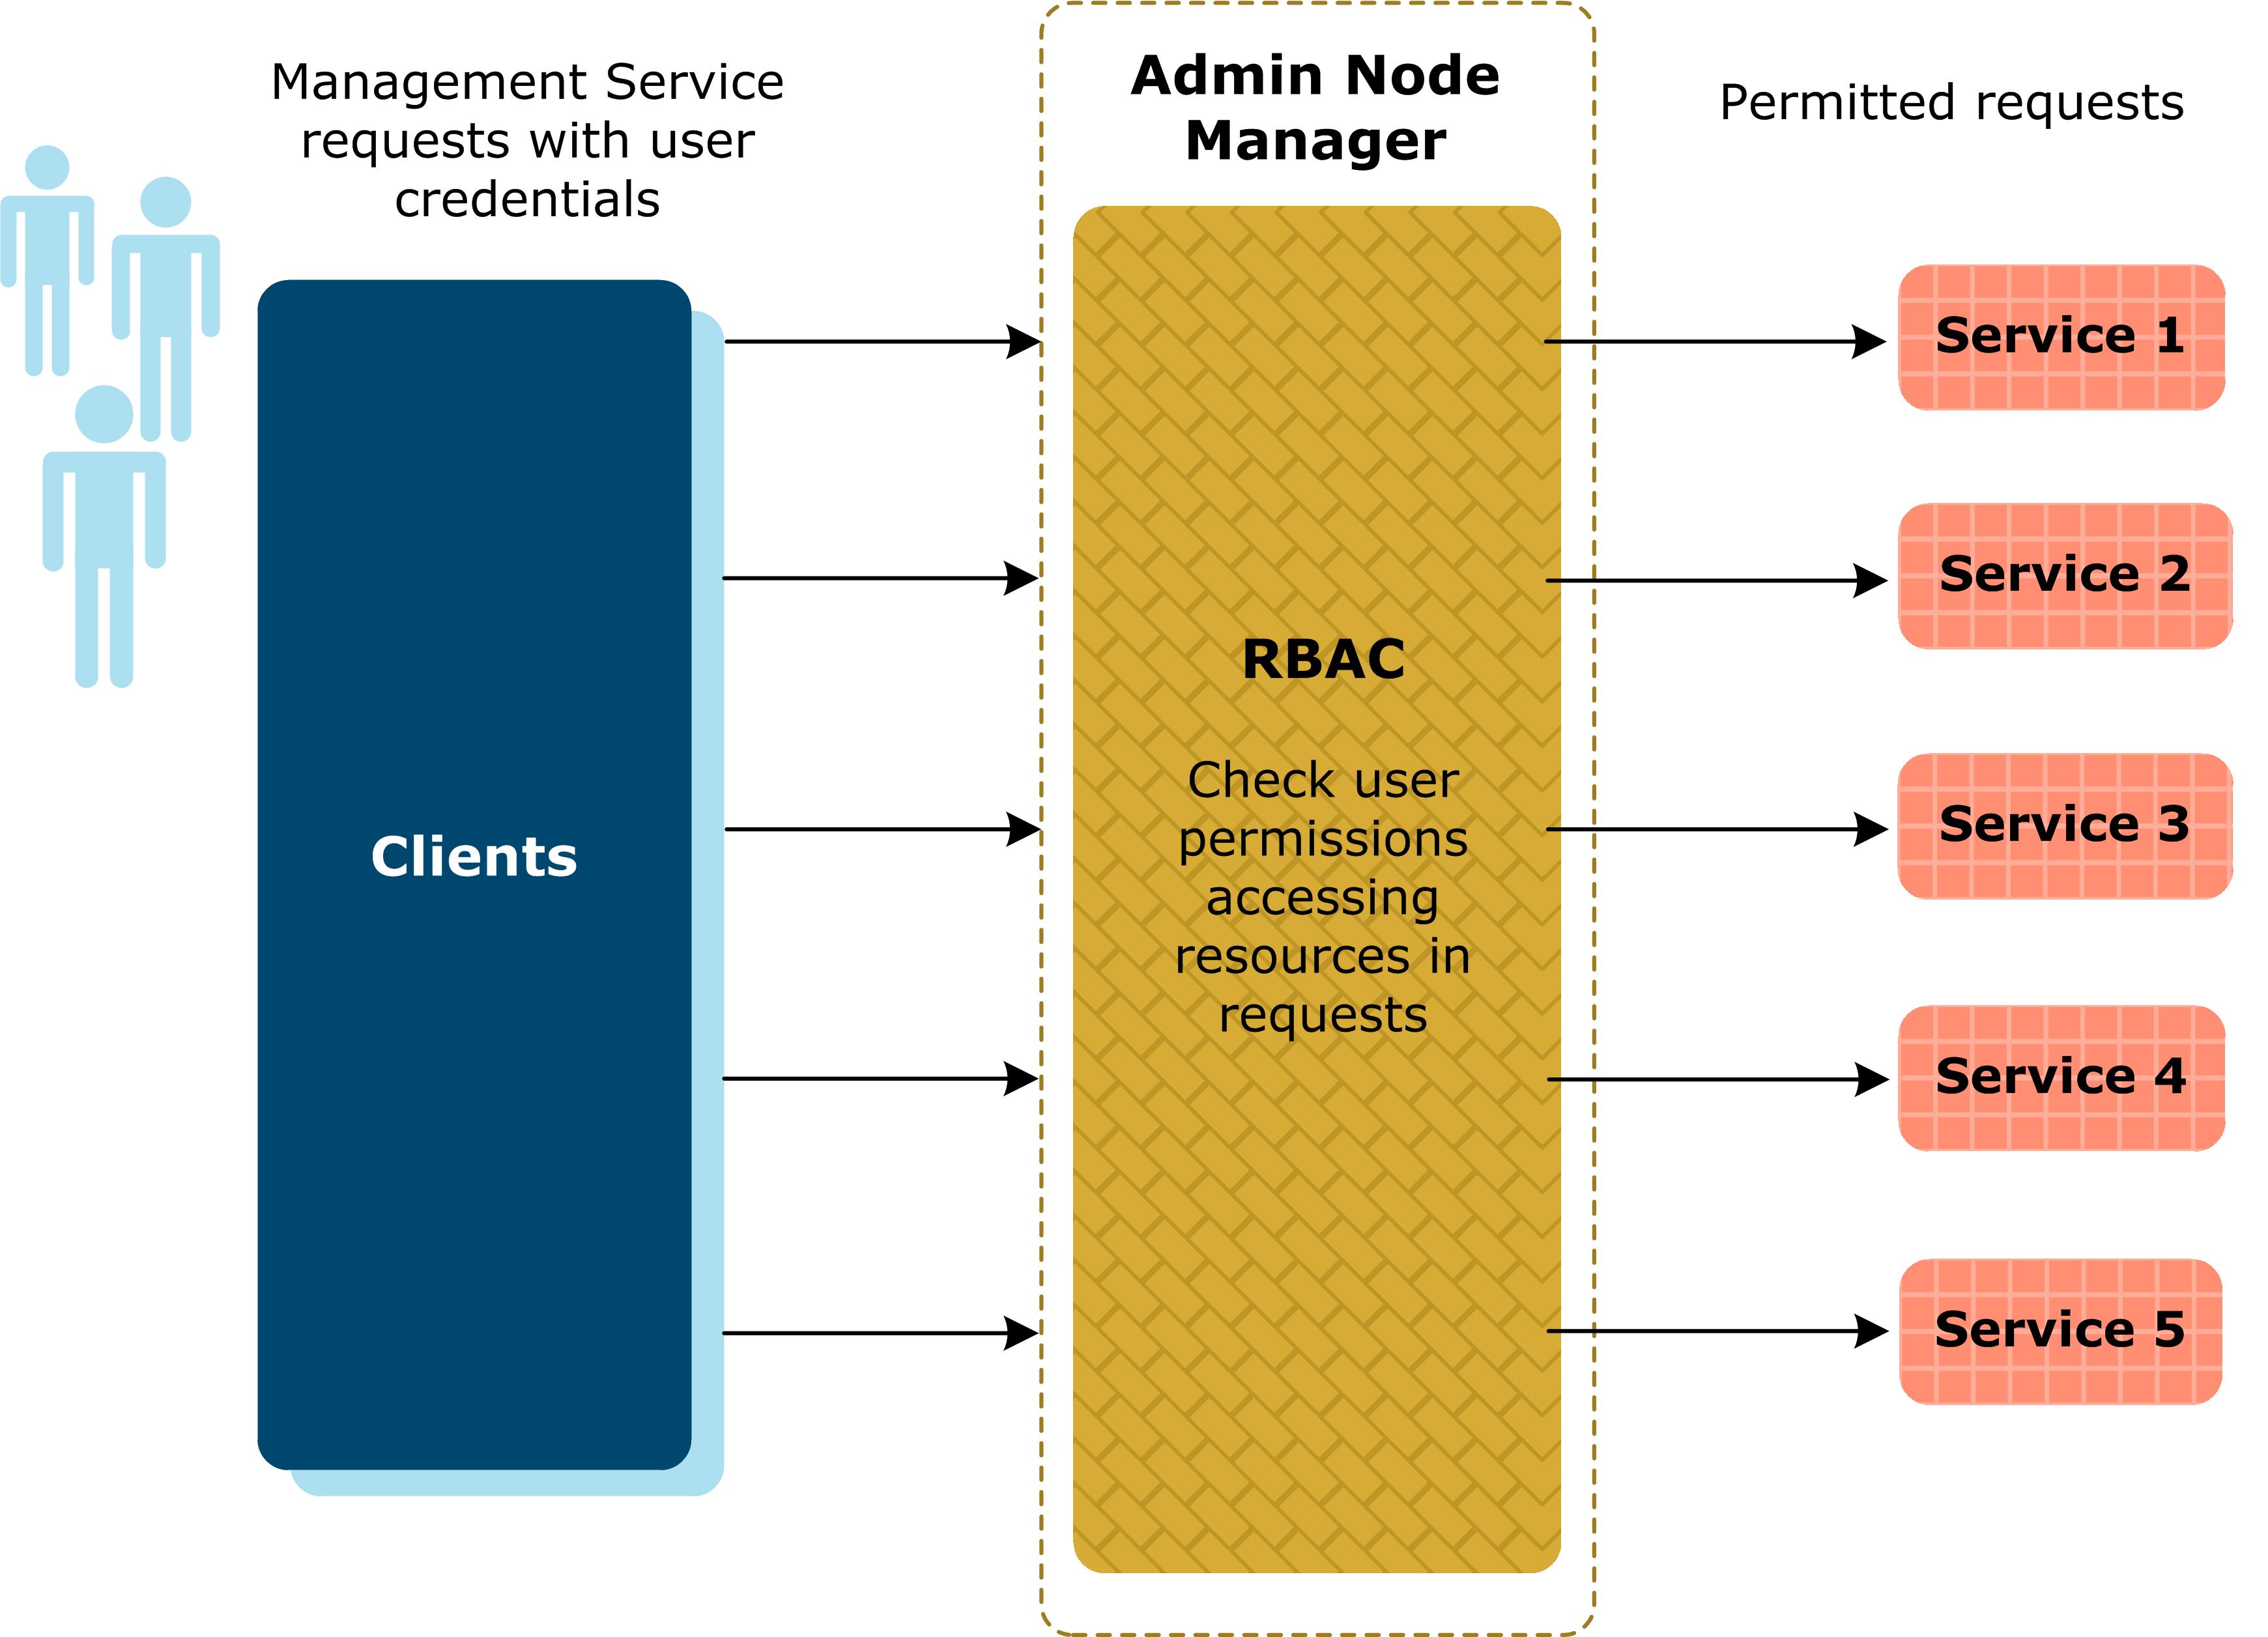 Configure Role-Based Access Control (RBAC)